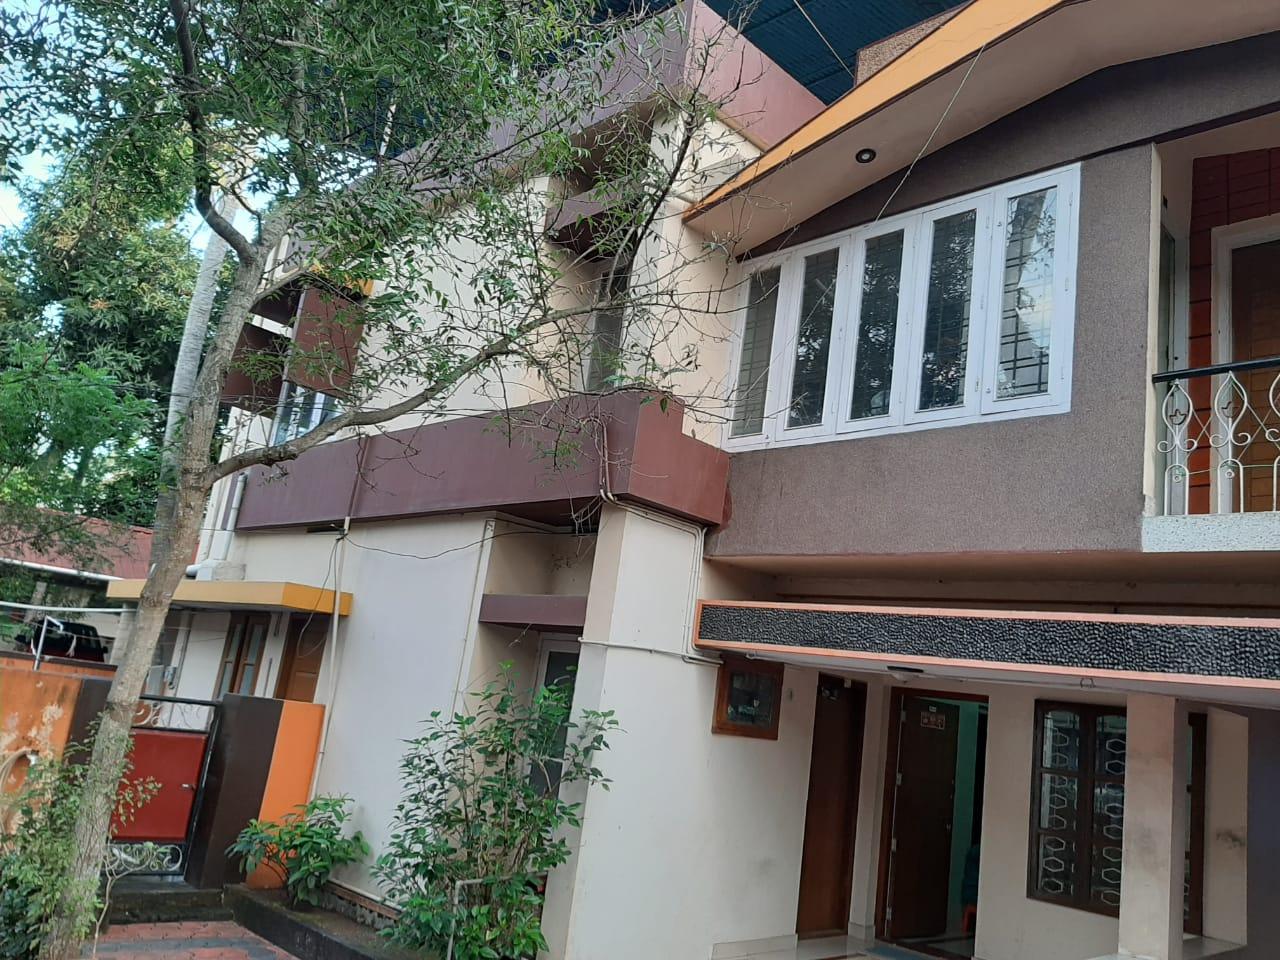 6BHK four bathroom House for sale at Pappanamcode, Thiruvananthapuram